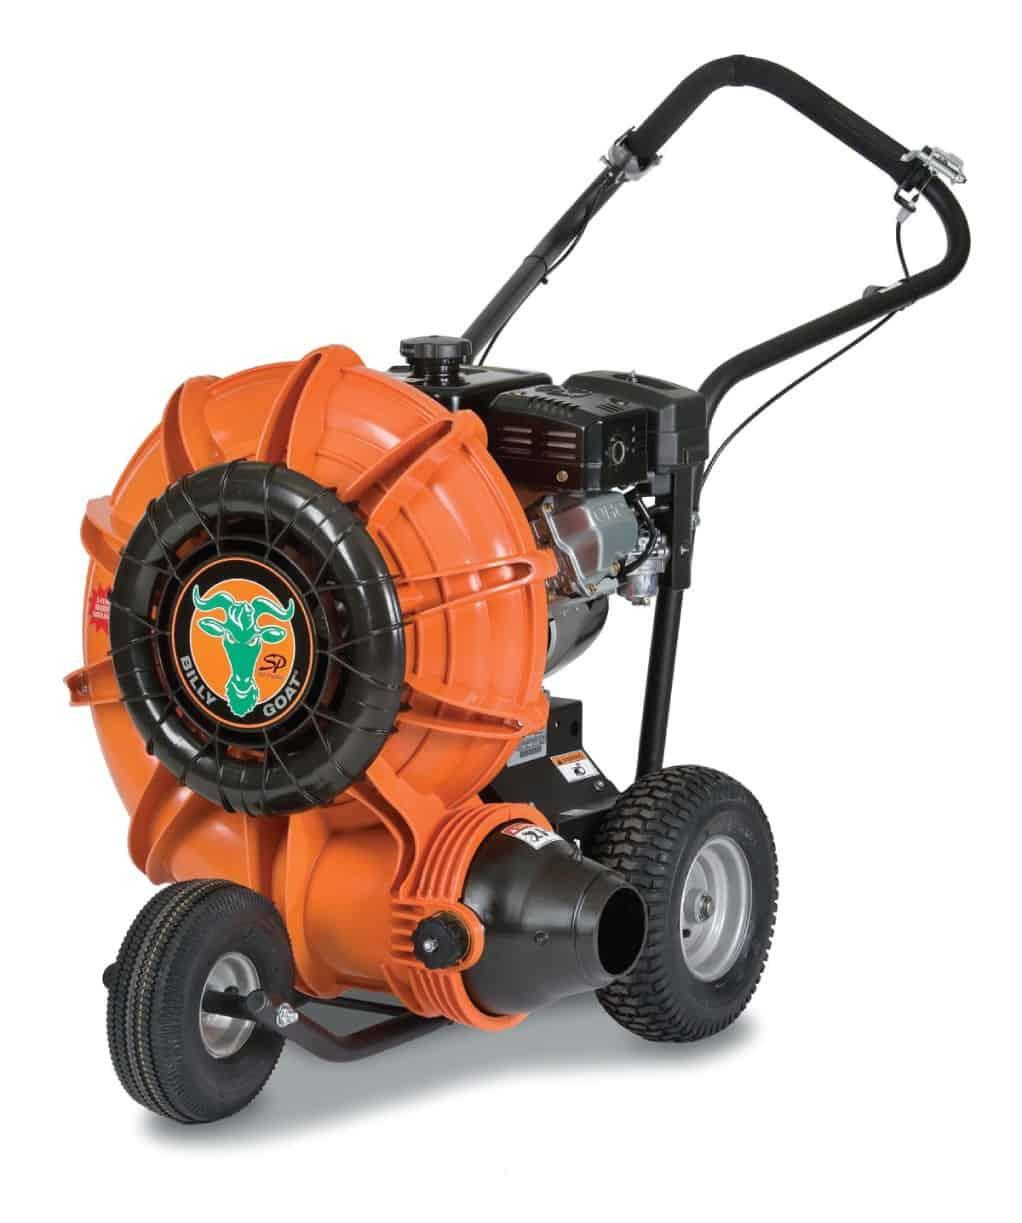 Billy Goat F1002SPV wheeled blower